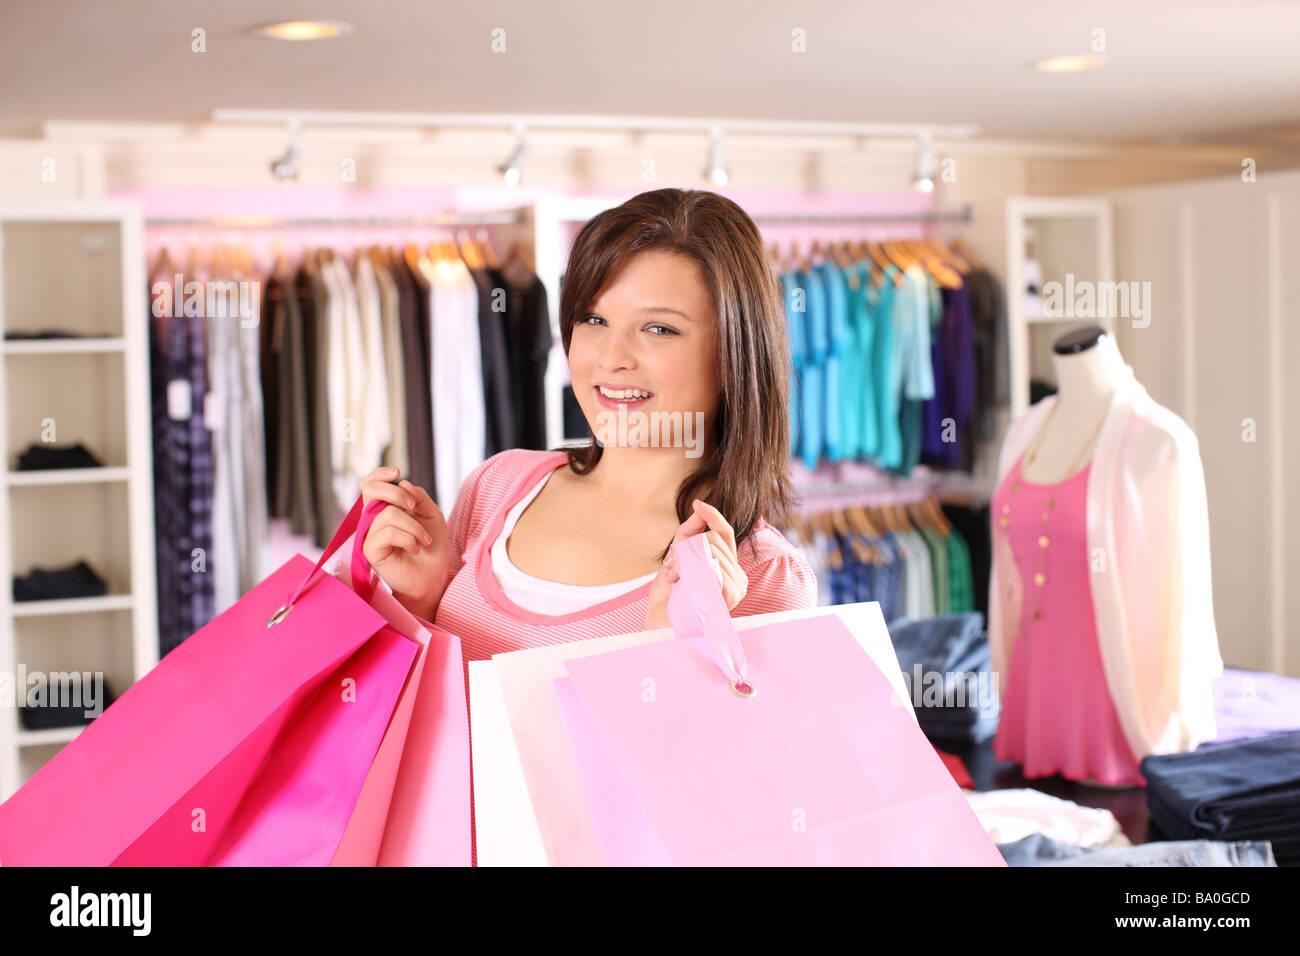 Teen shopper holding bags - Stock Image